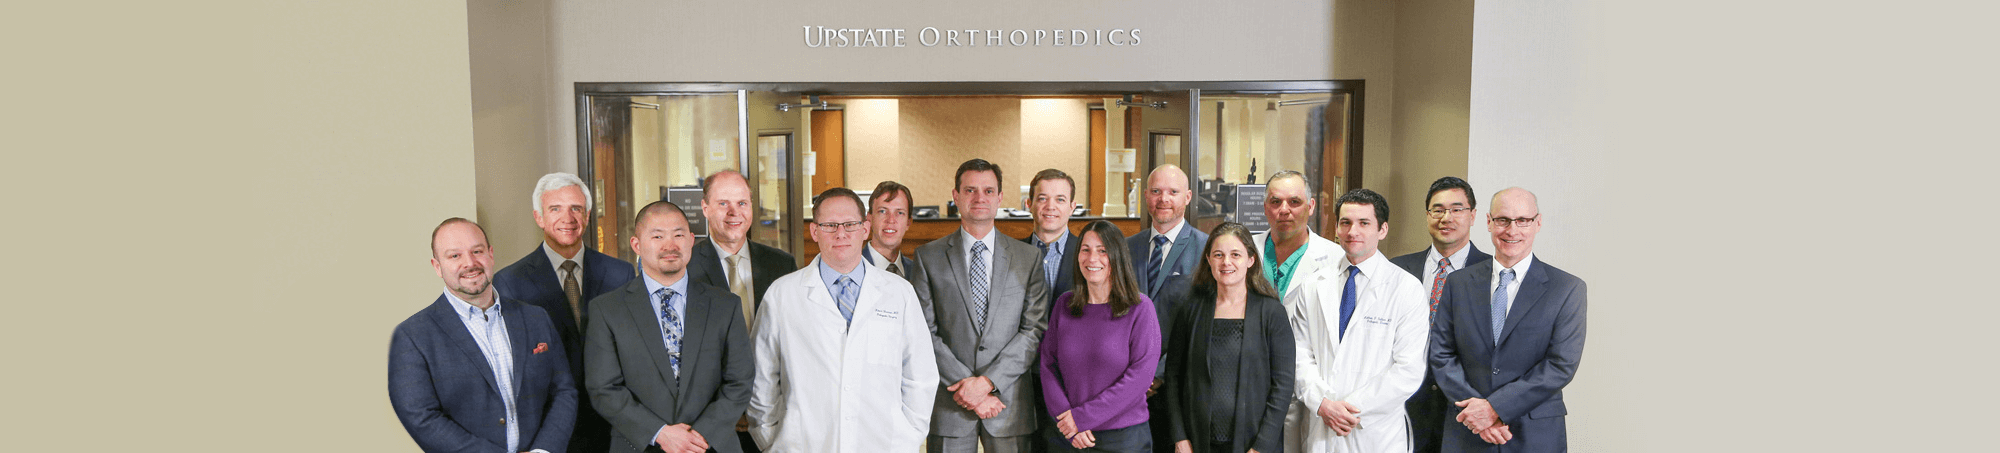 Upstate Orthopedics - Orthopedic Specialists in Syracuse, New York